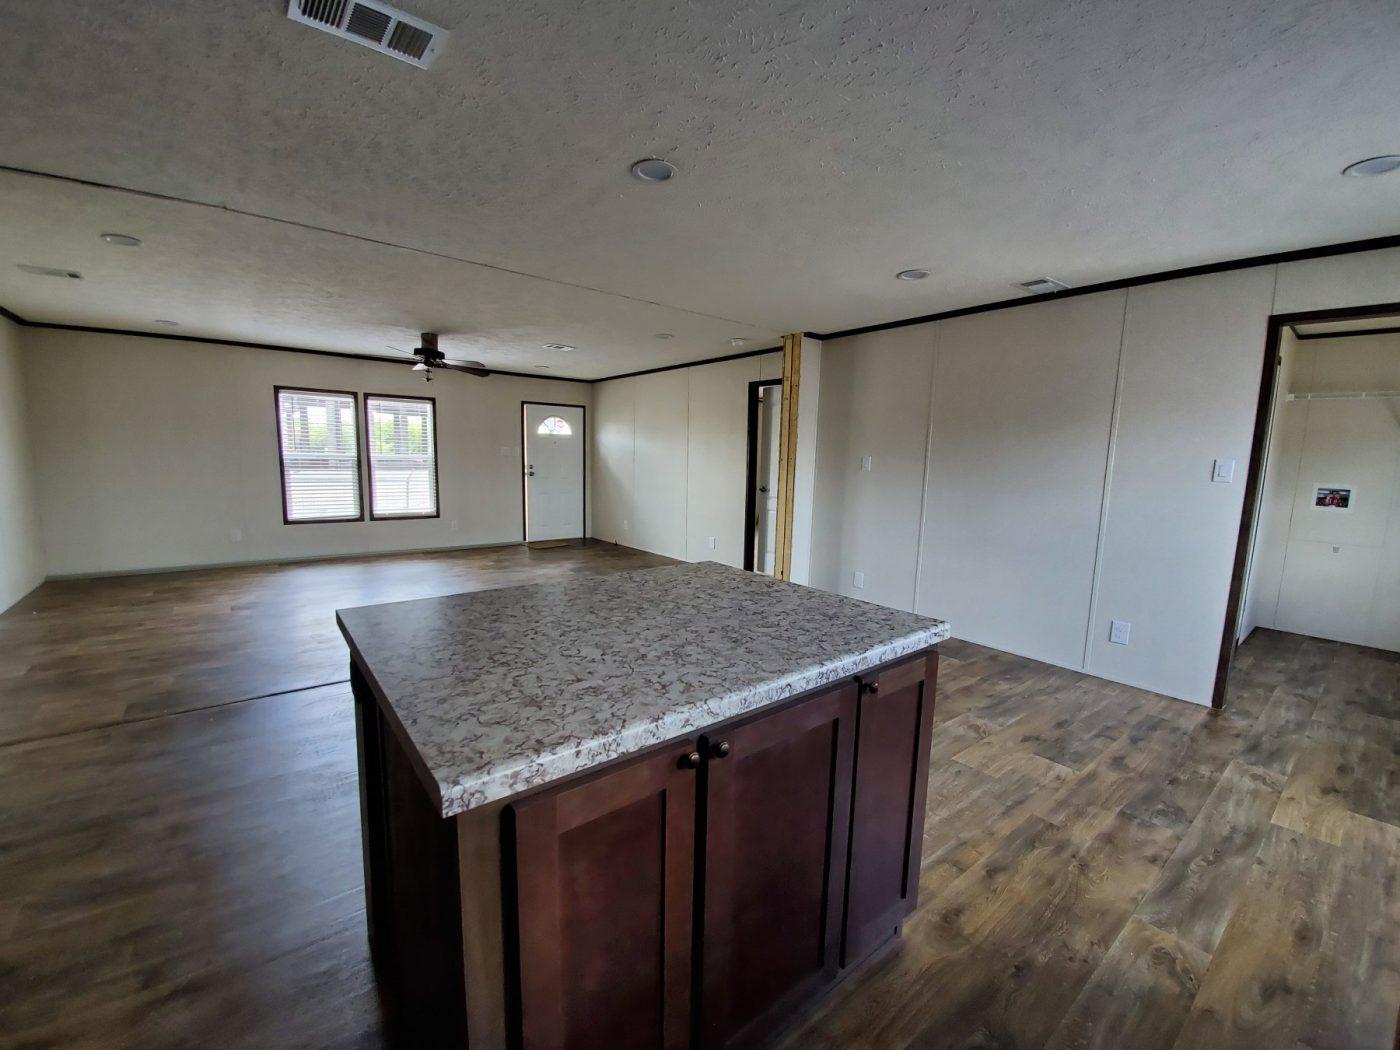 New Vision Burnett Nunn Homes Manufactured Homes